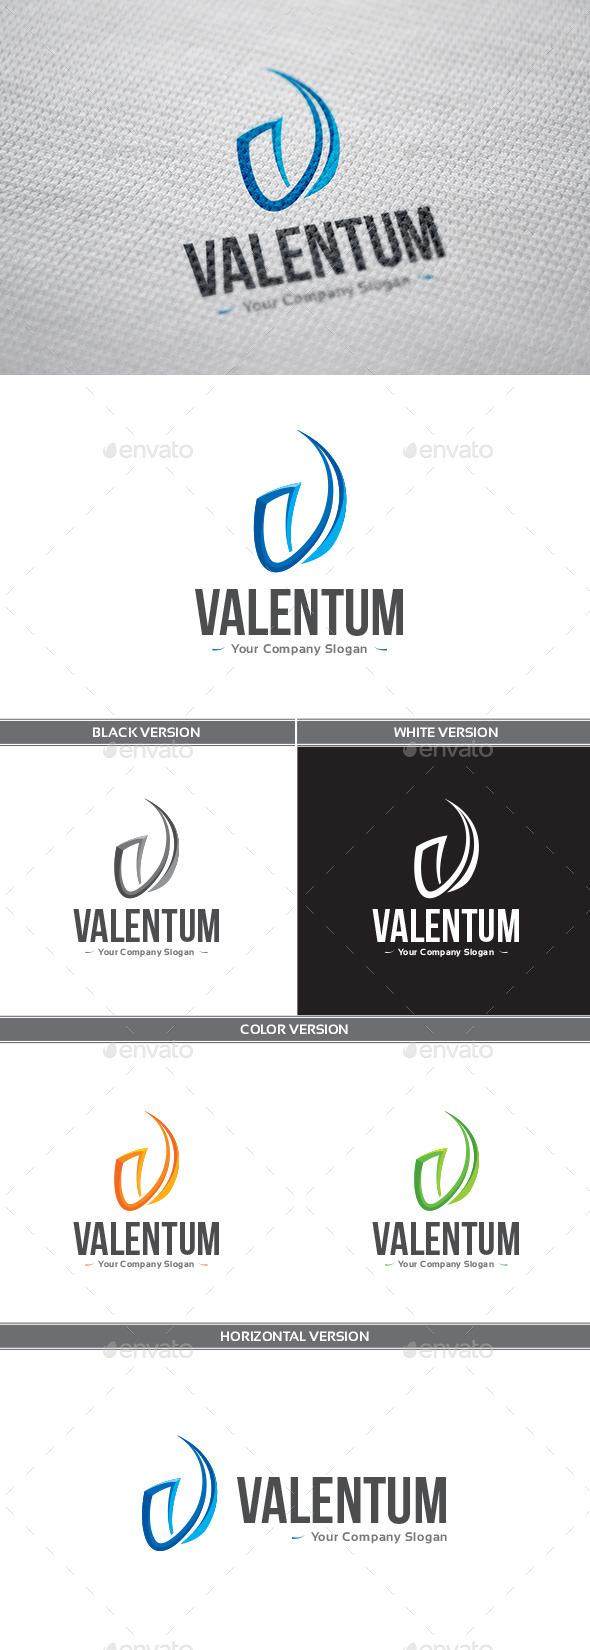 GraphicRiver Valentum Logo 9328117